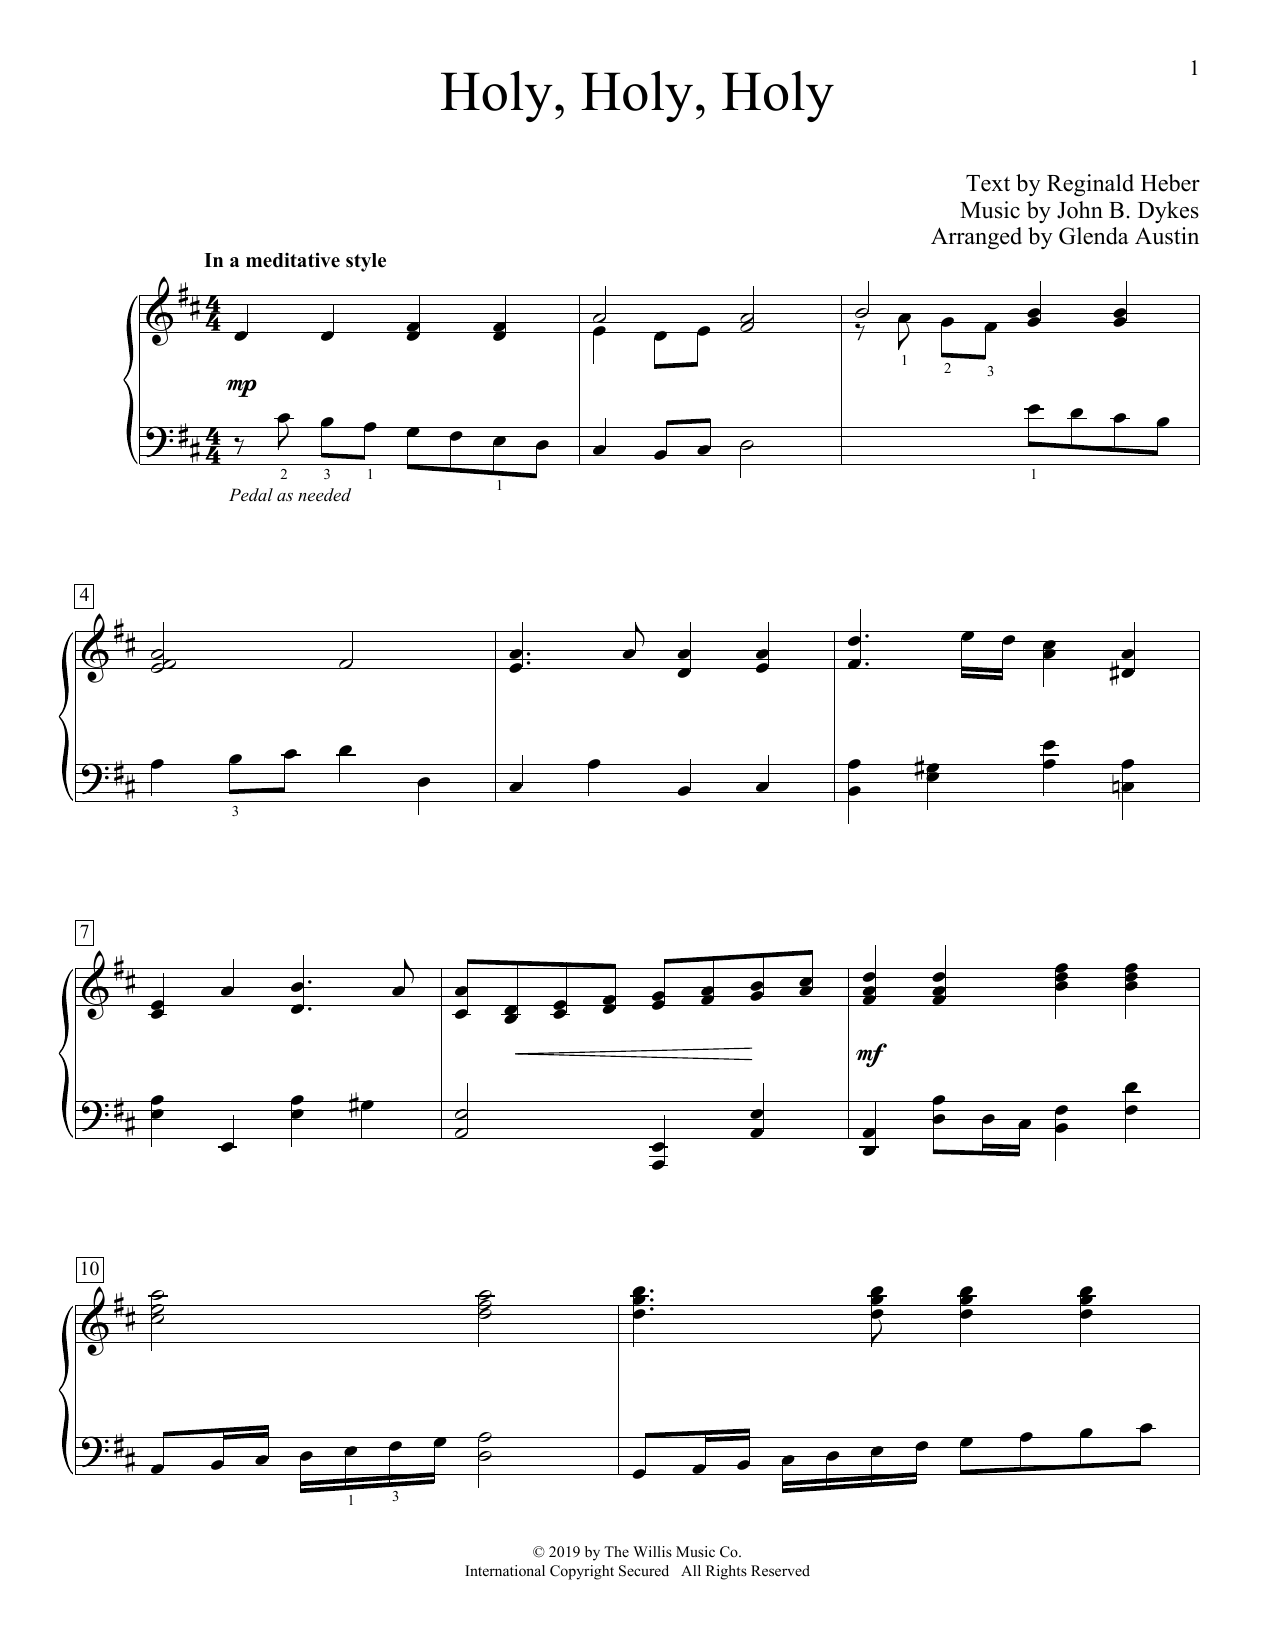 Holy, Holy, Holy (arr. Glenda Austin) (Educational Piano)